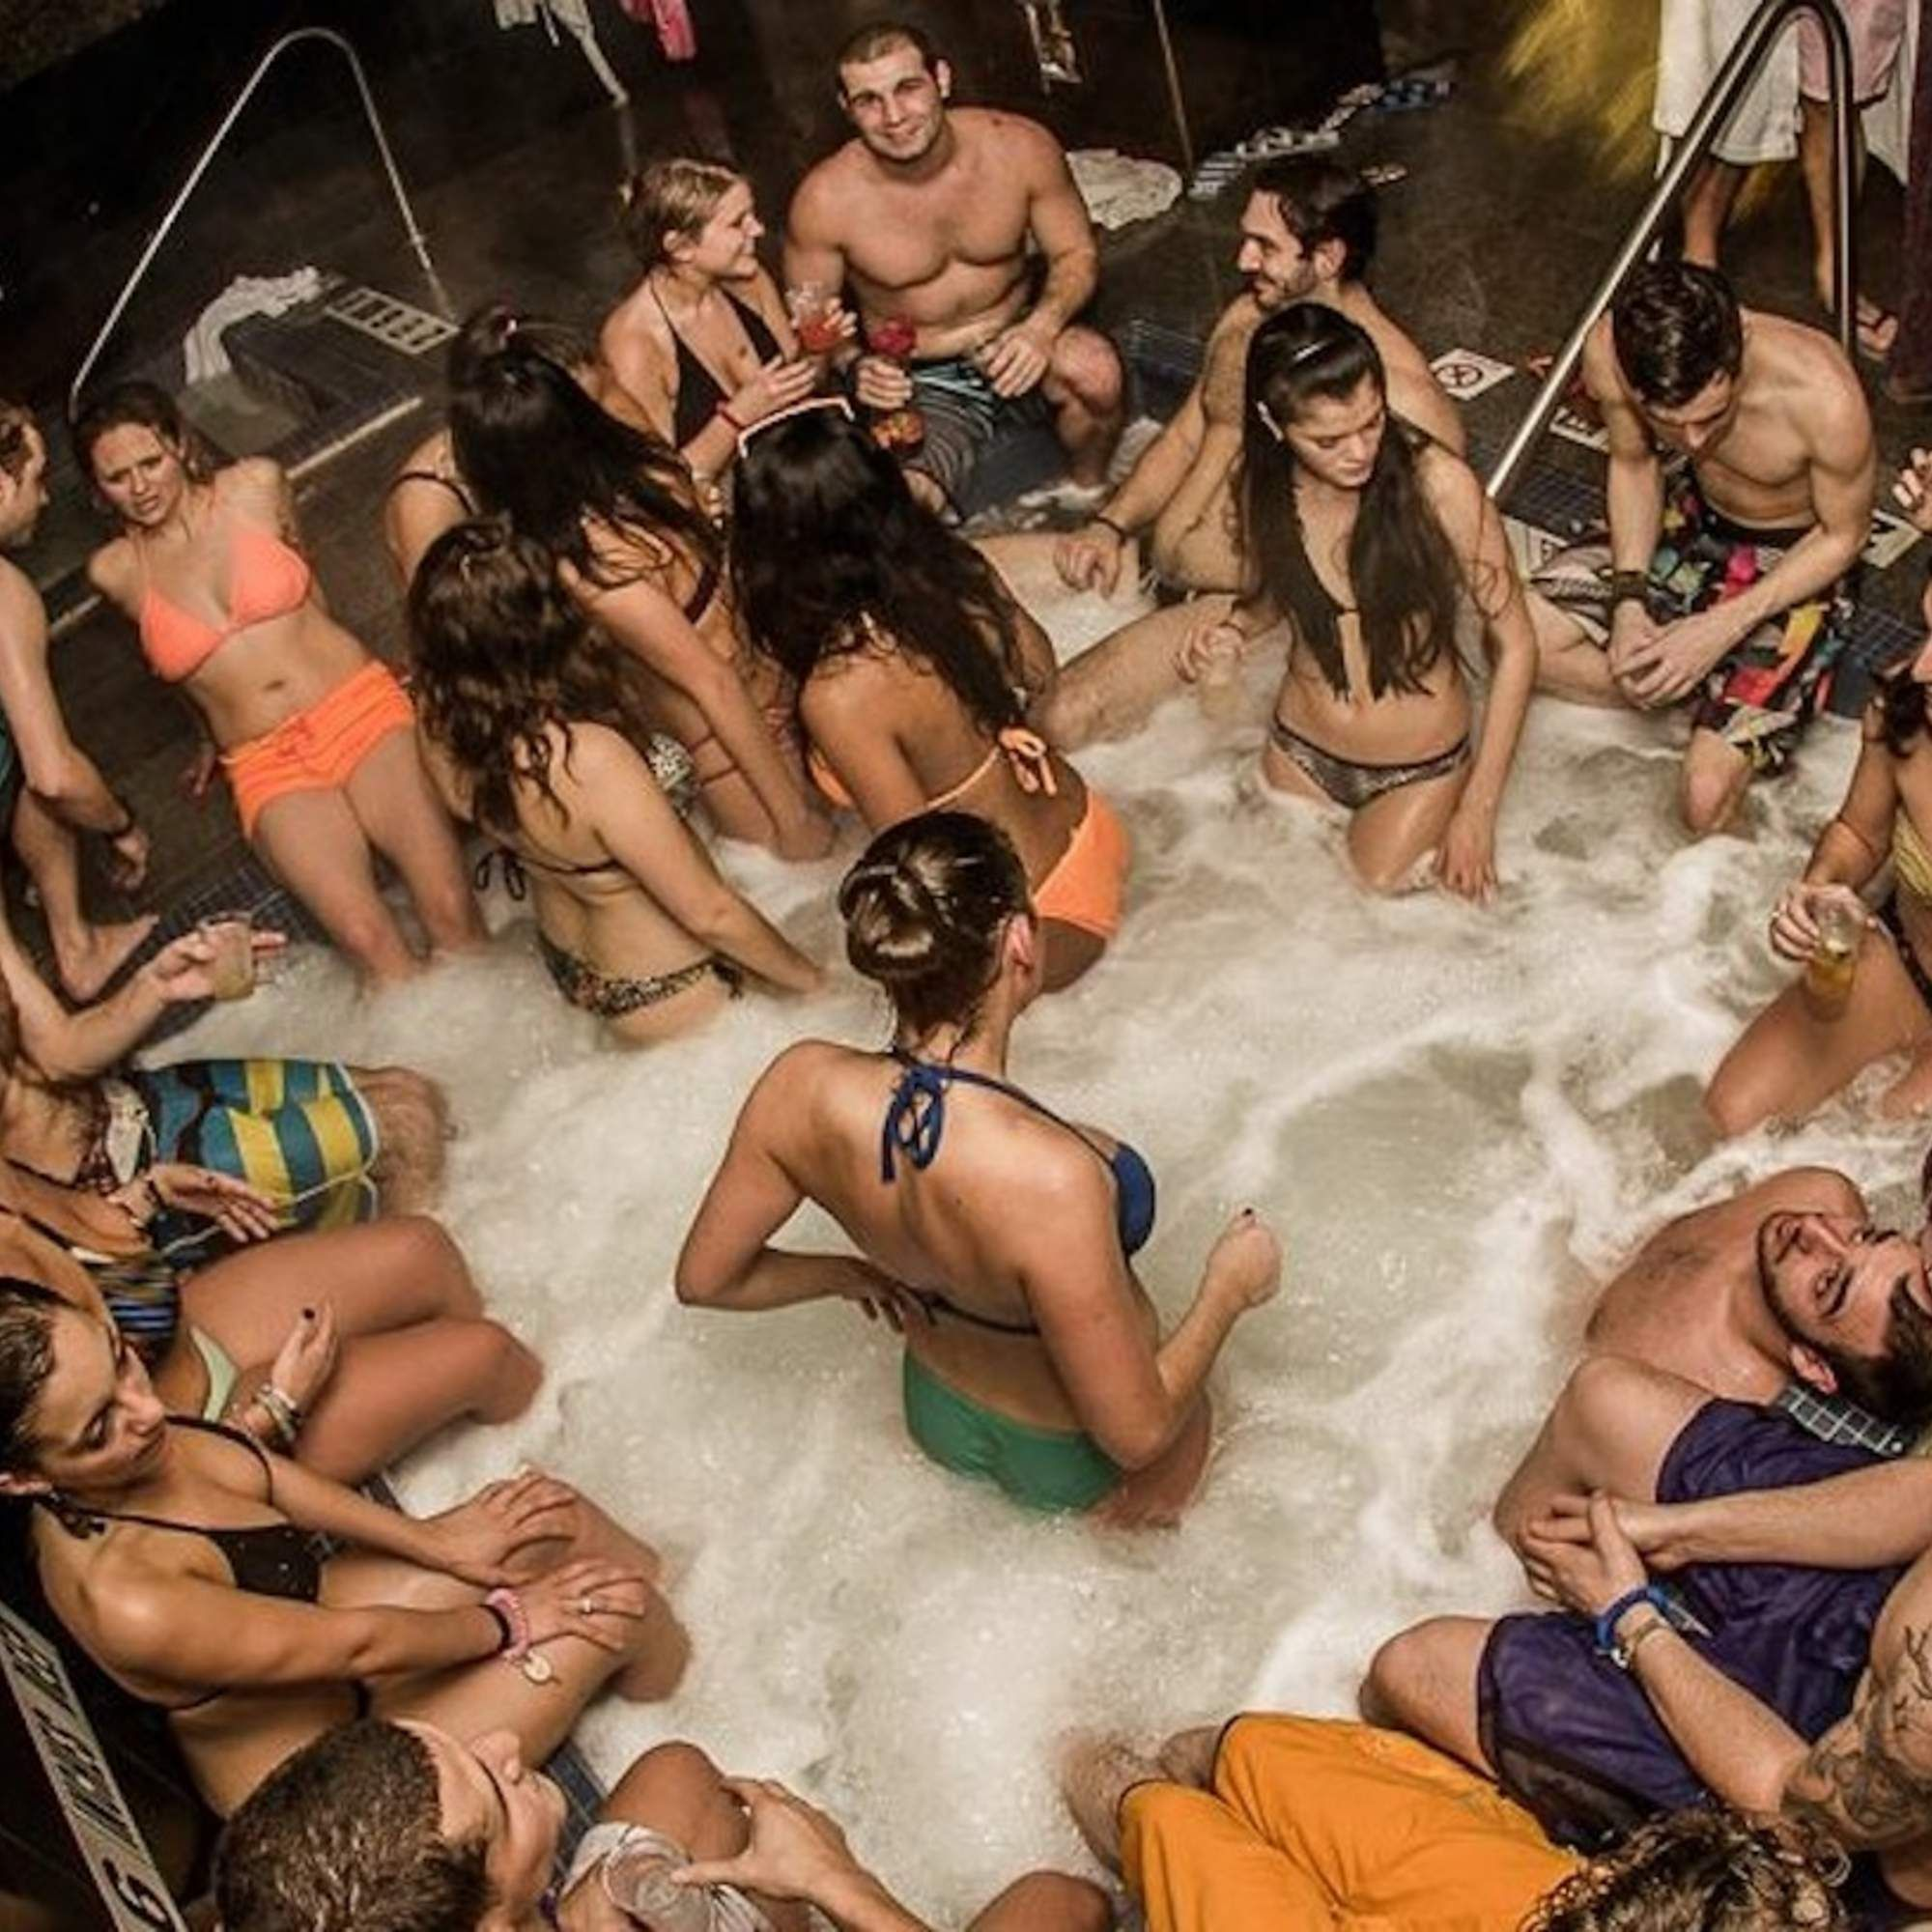 Sex Spa New York